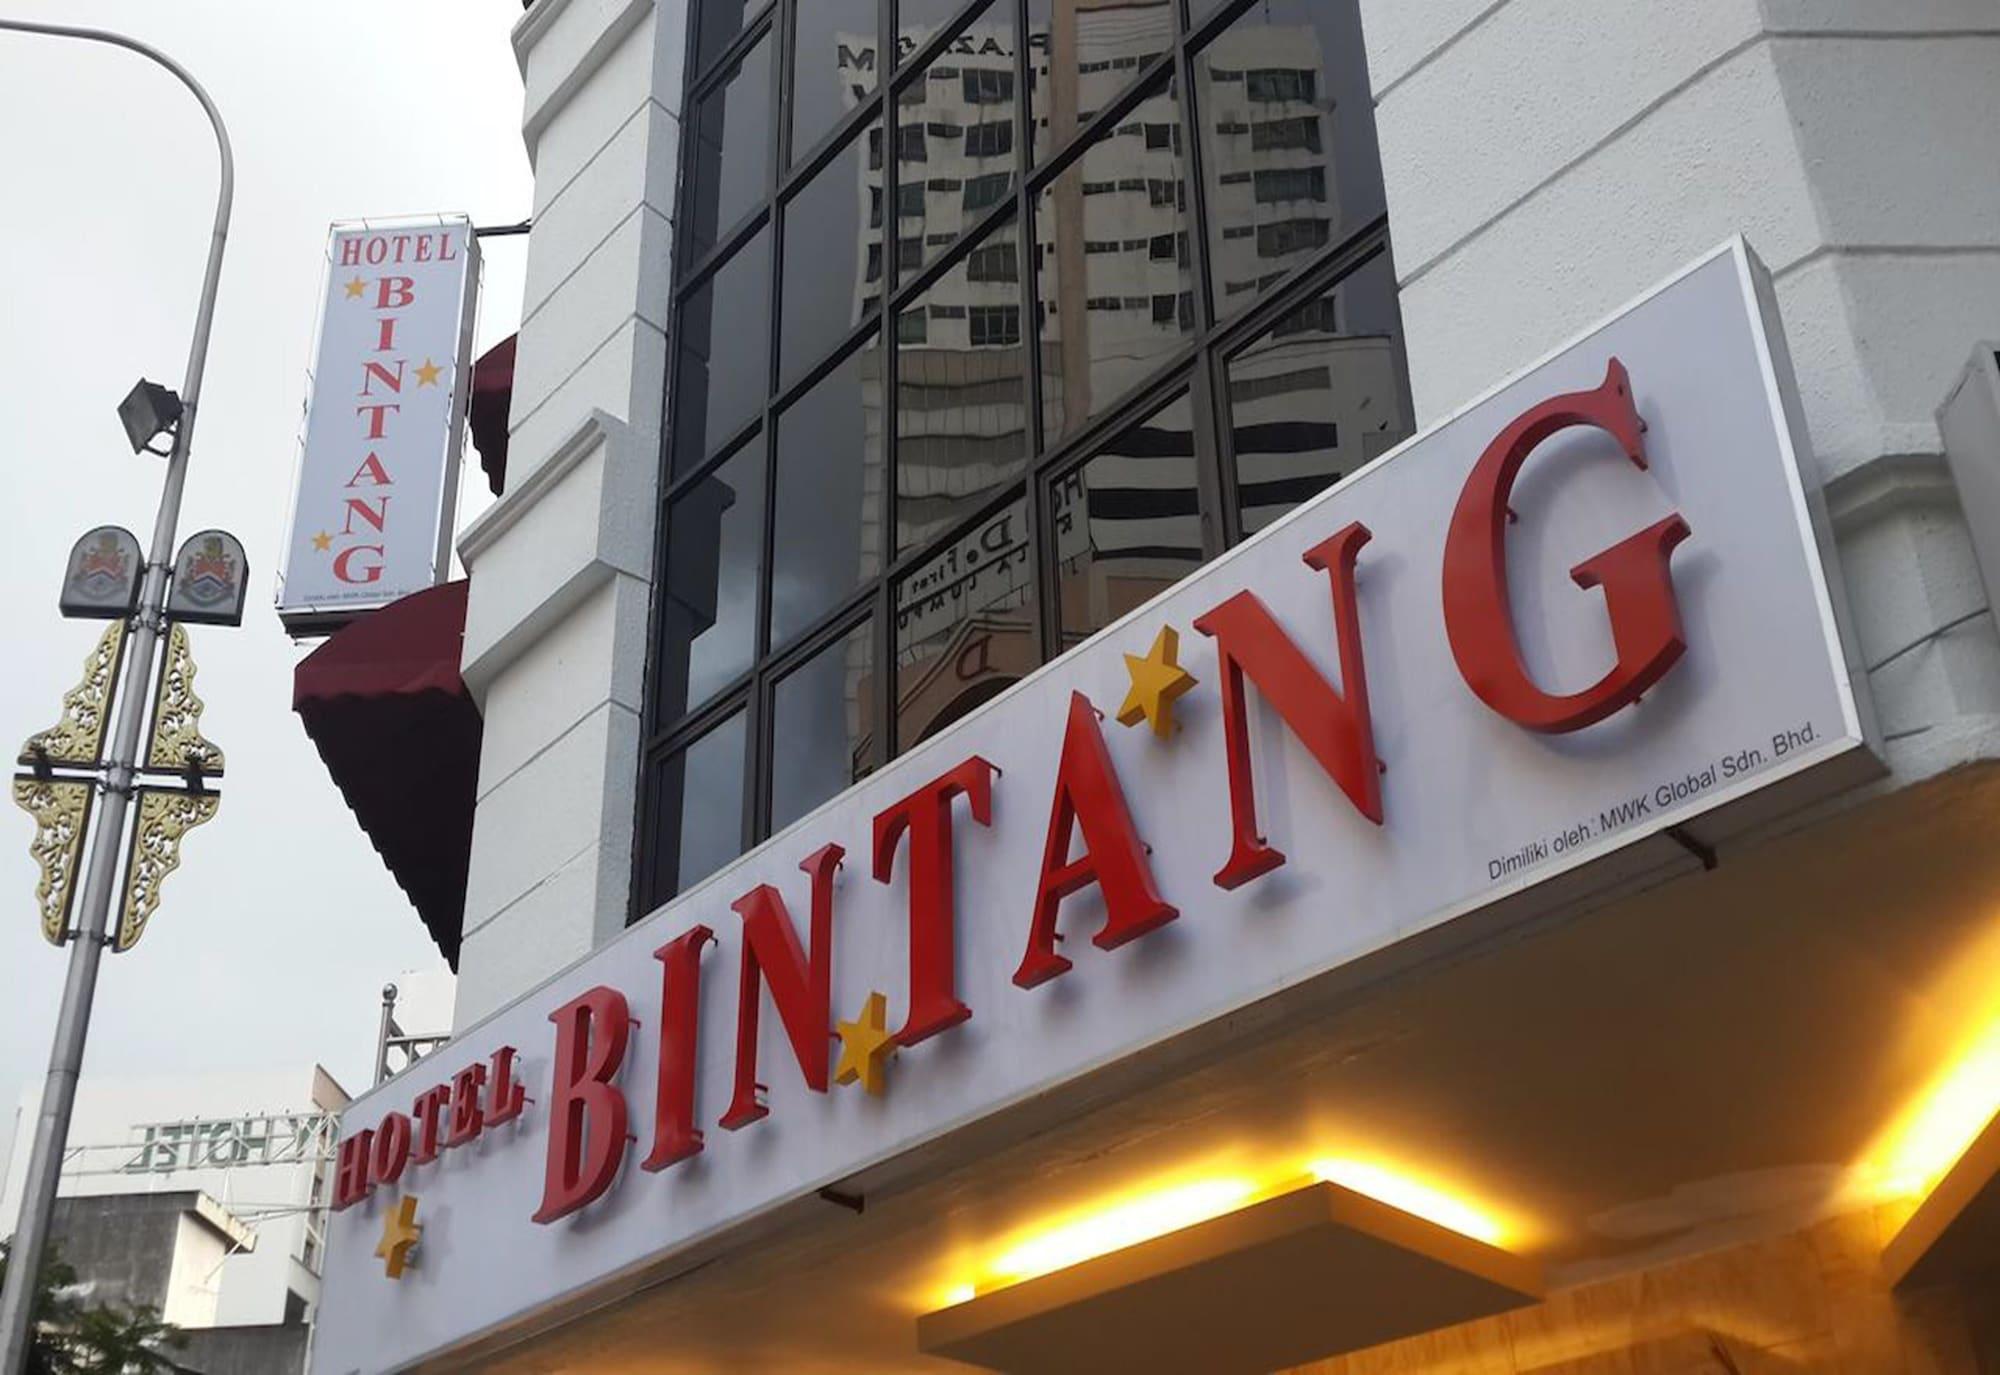 Hotel Bintang, Kuala Lumpur